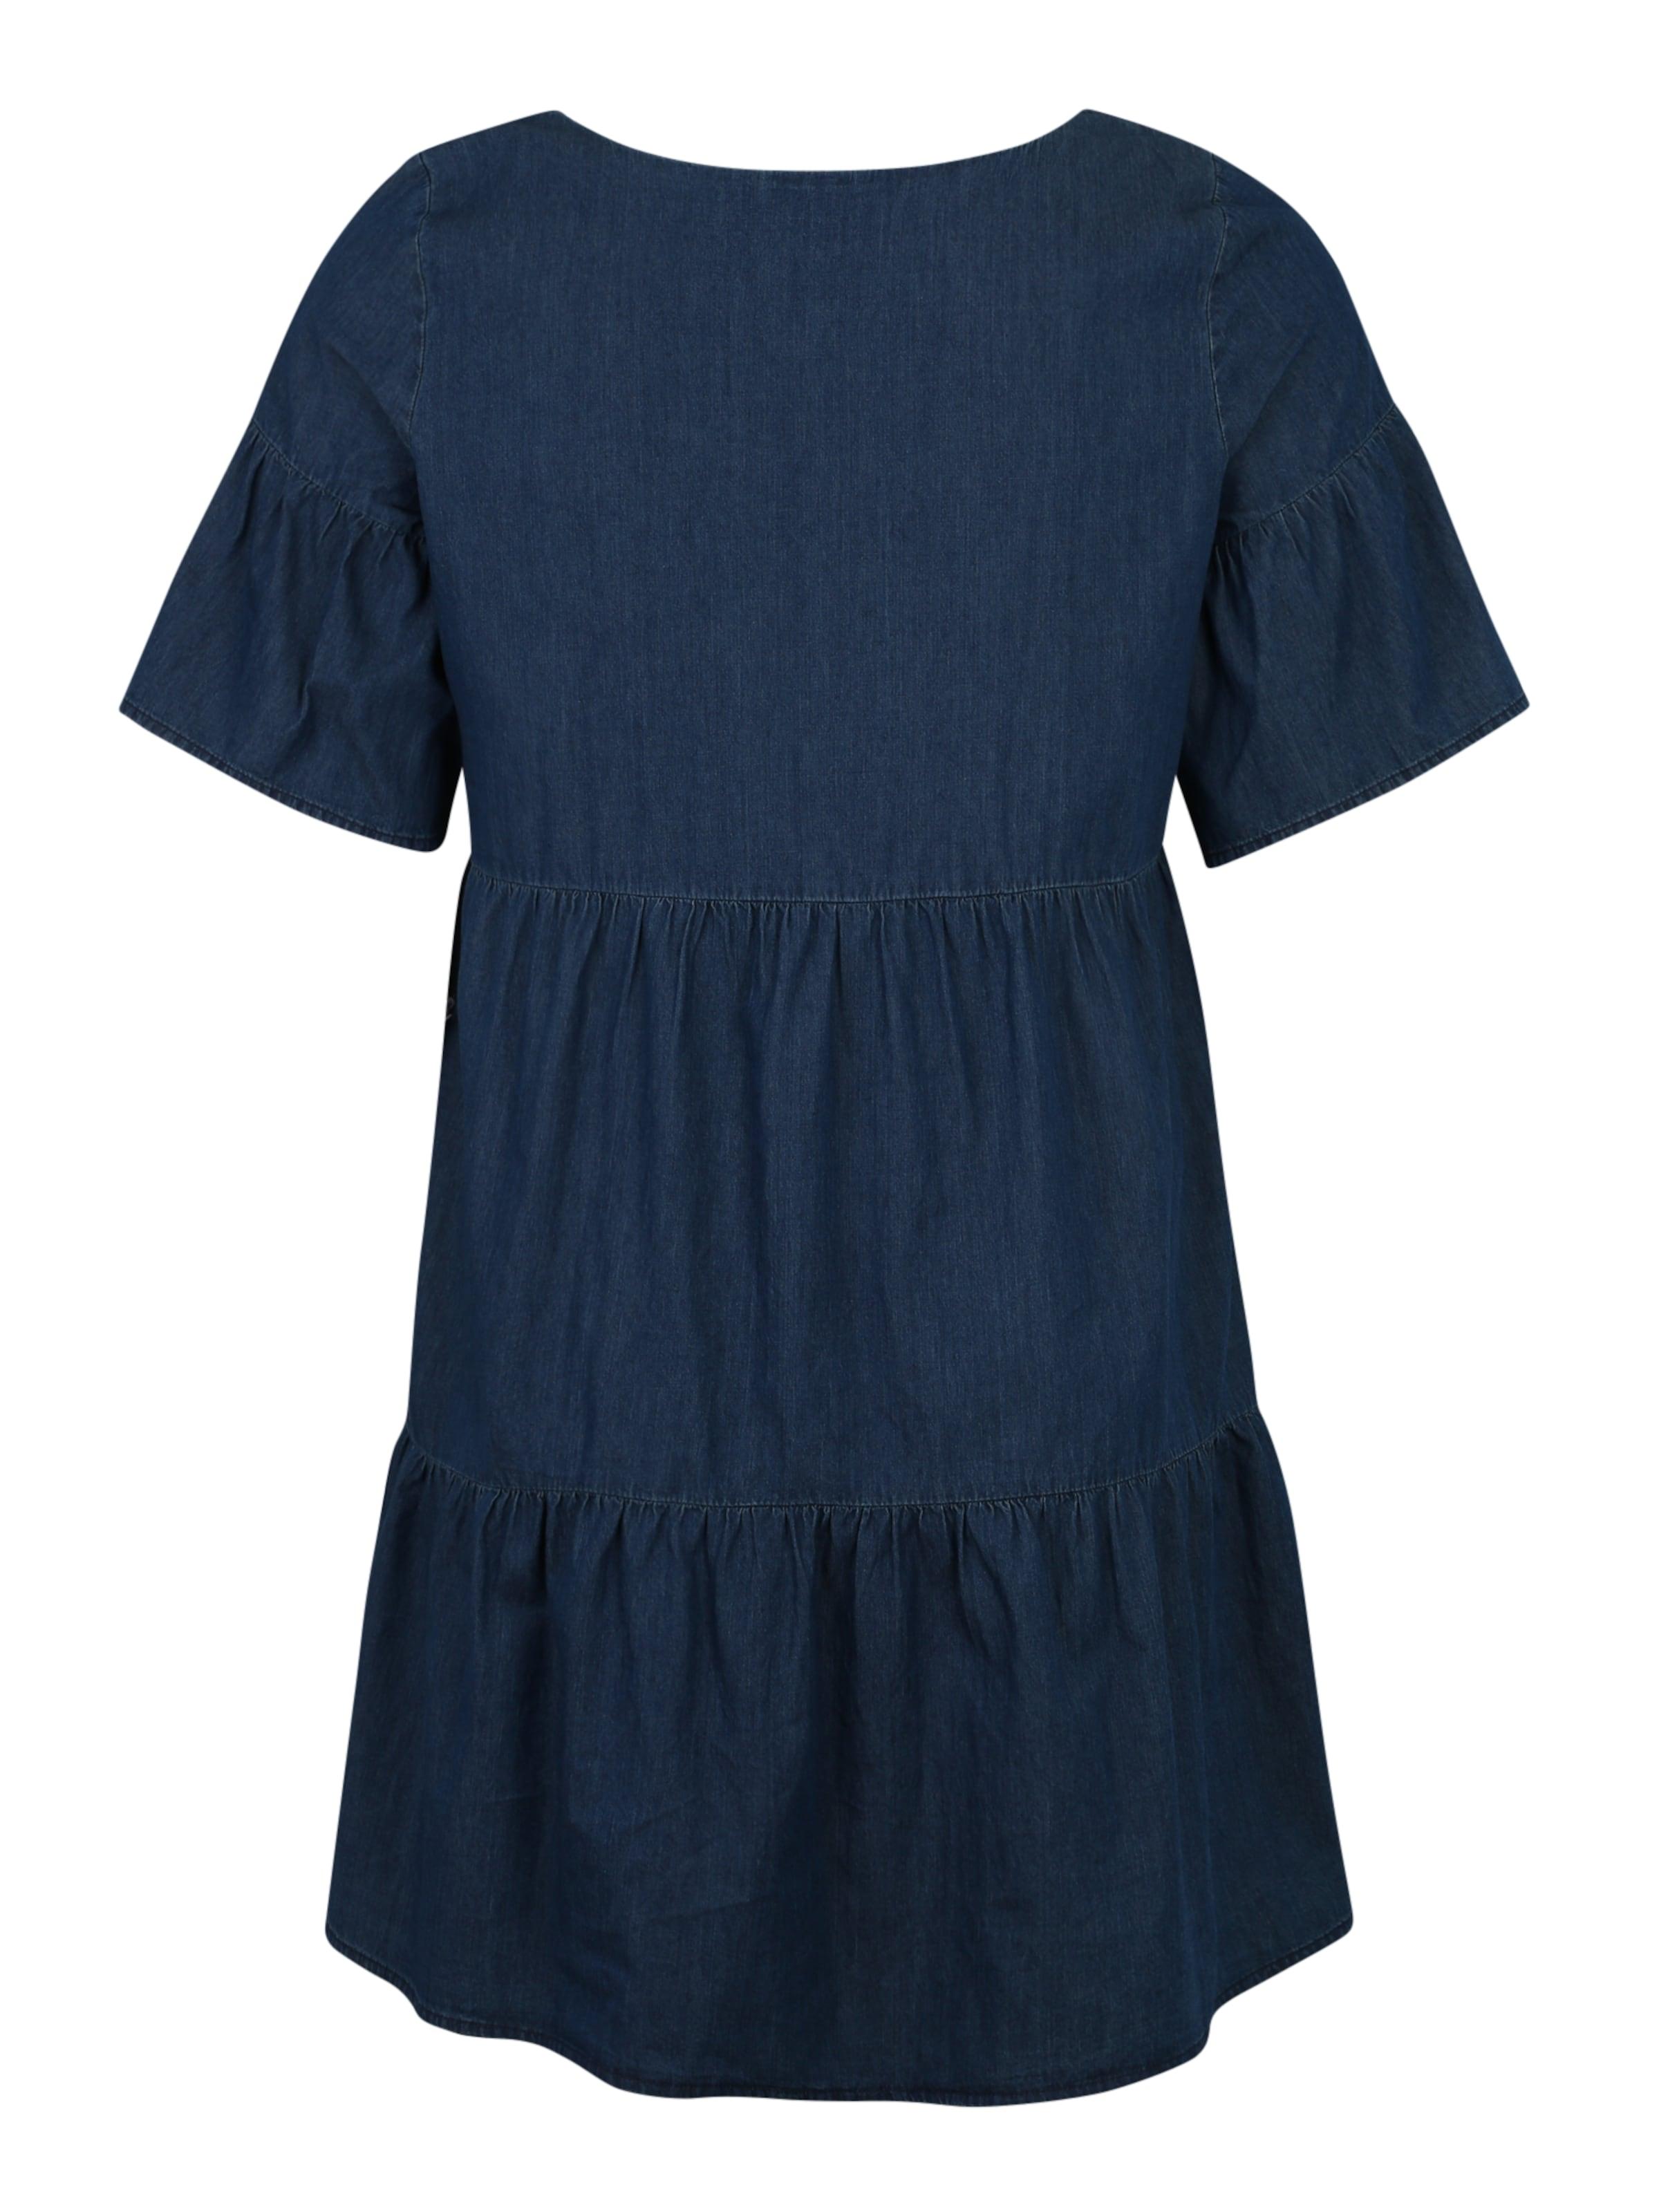 En Bleu Junarose 'allegra' Denim Robe lKJ3TF5u1c